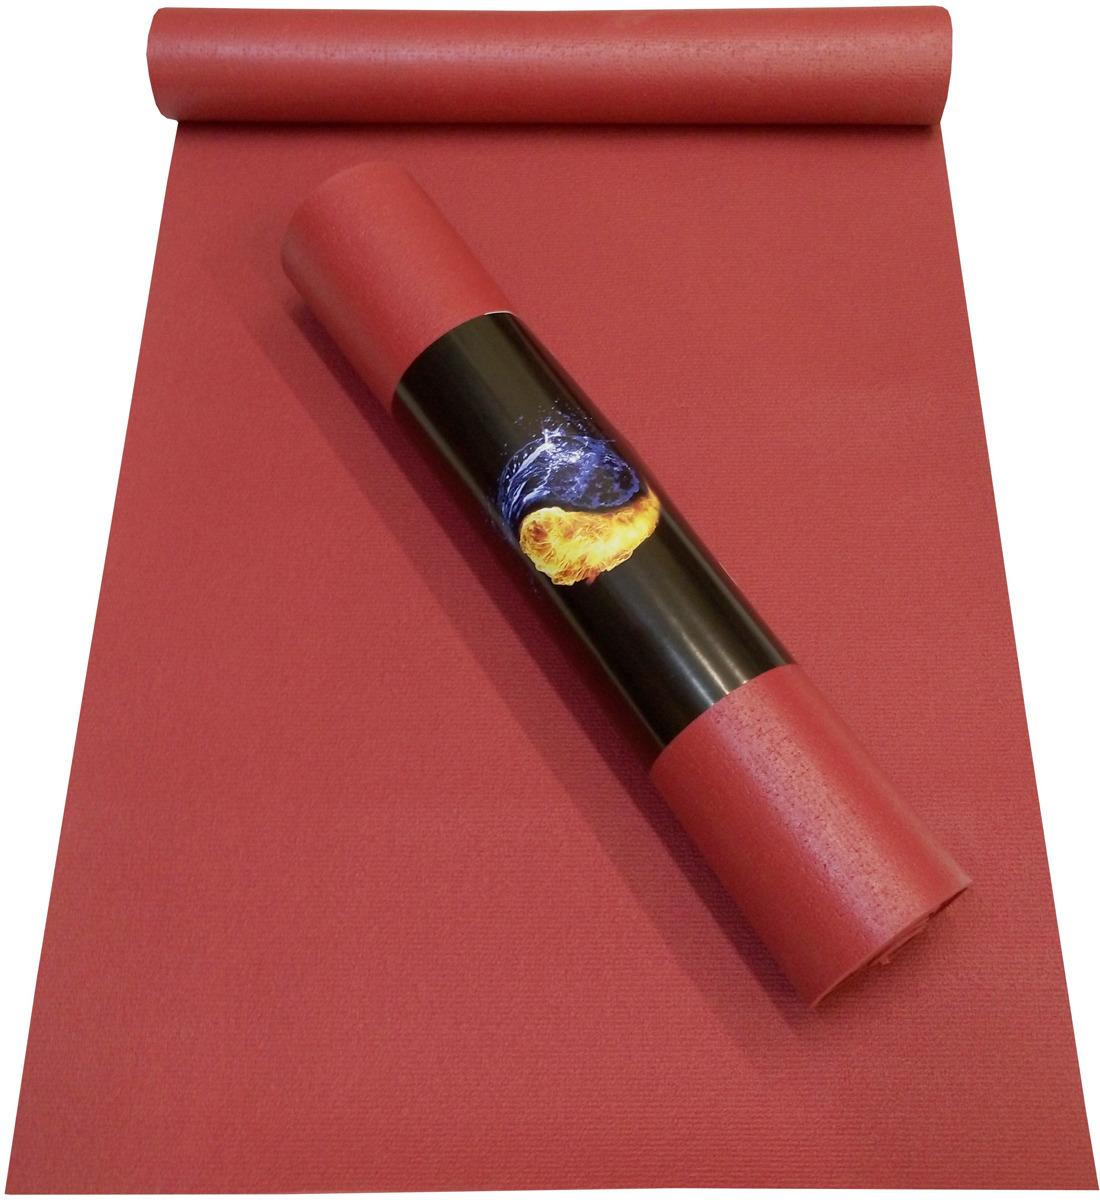 Коврик для йоги Ako-Yoga Yin-Yang Studio, цвет: бордо, 220 х 80 см цены